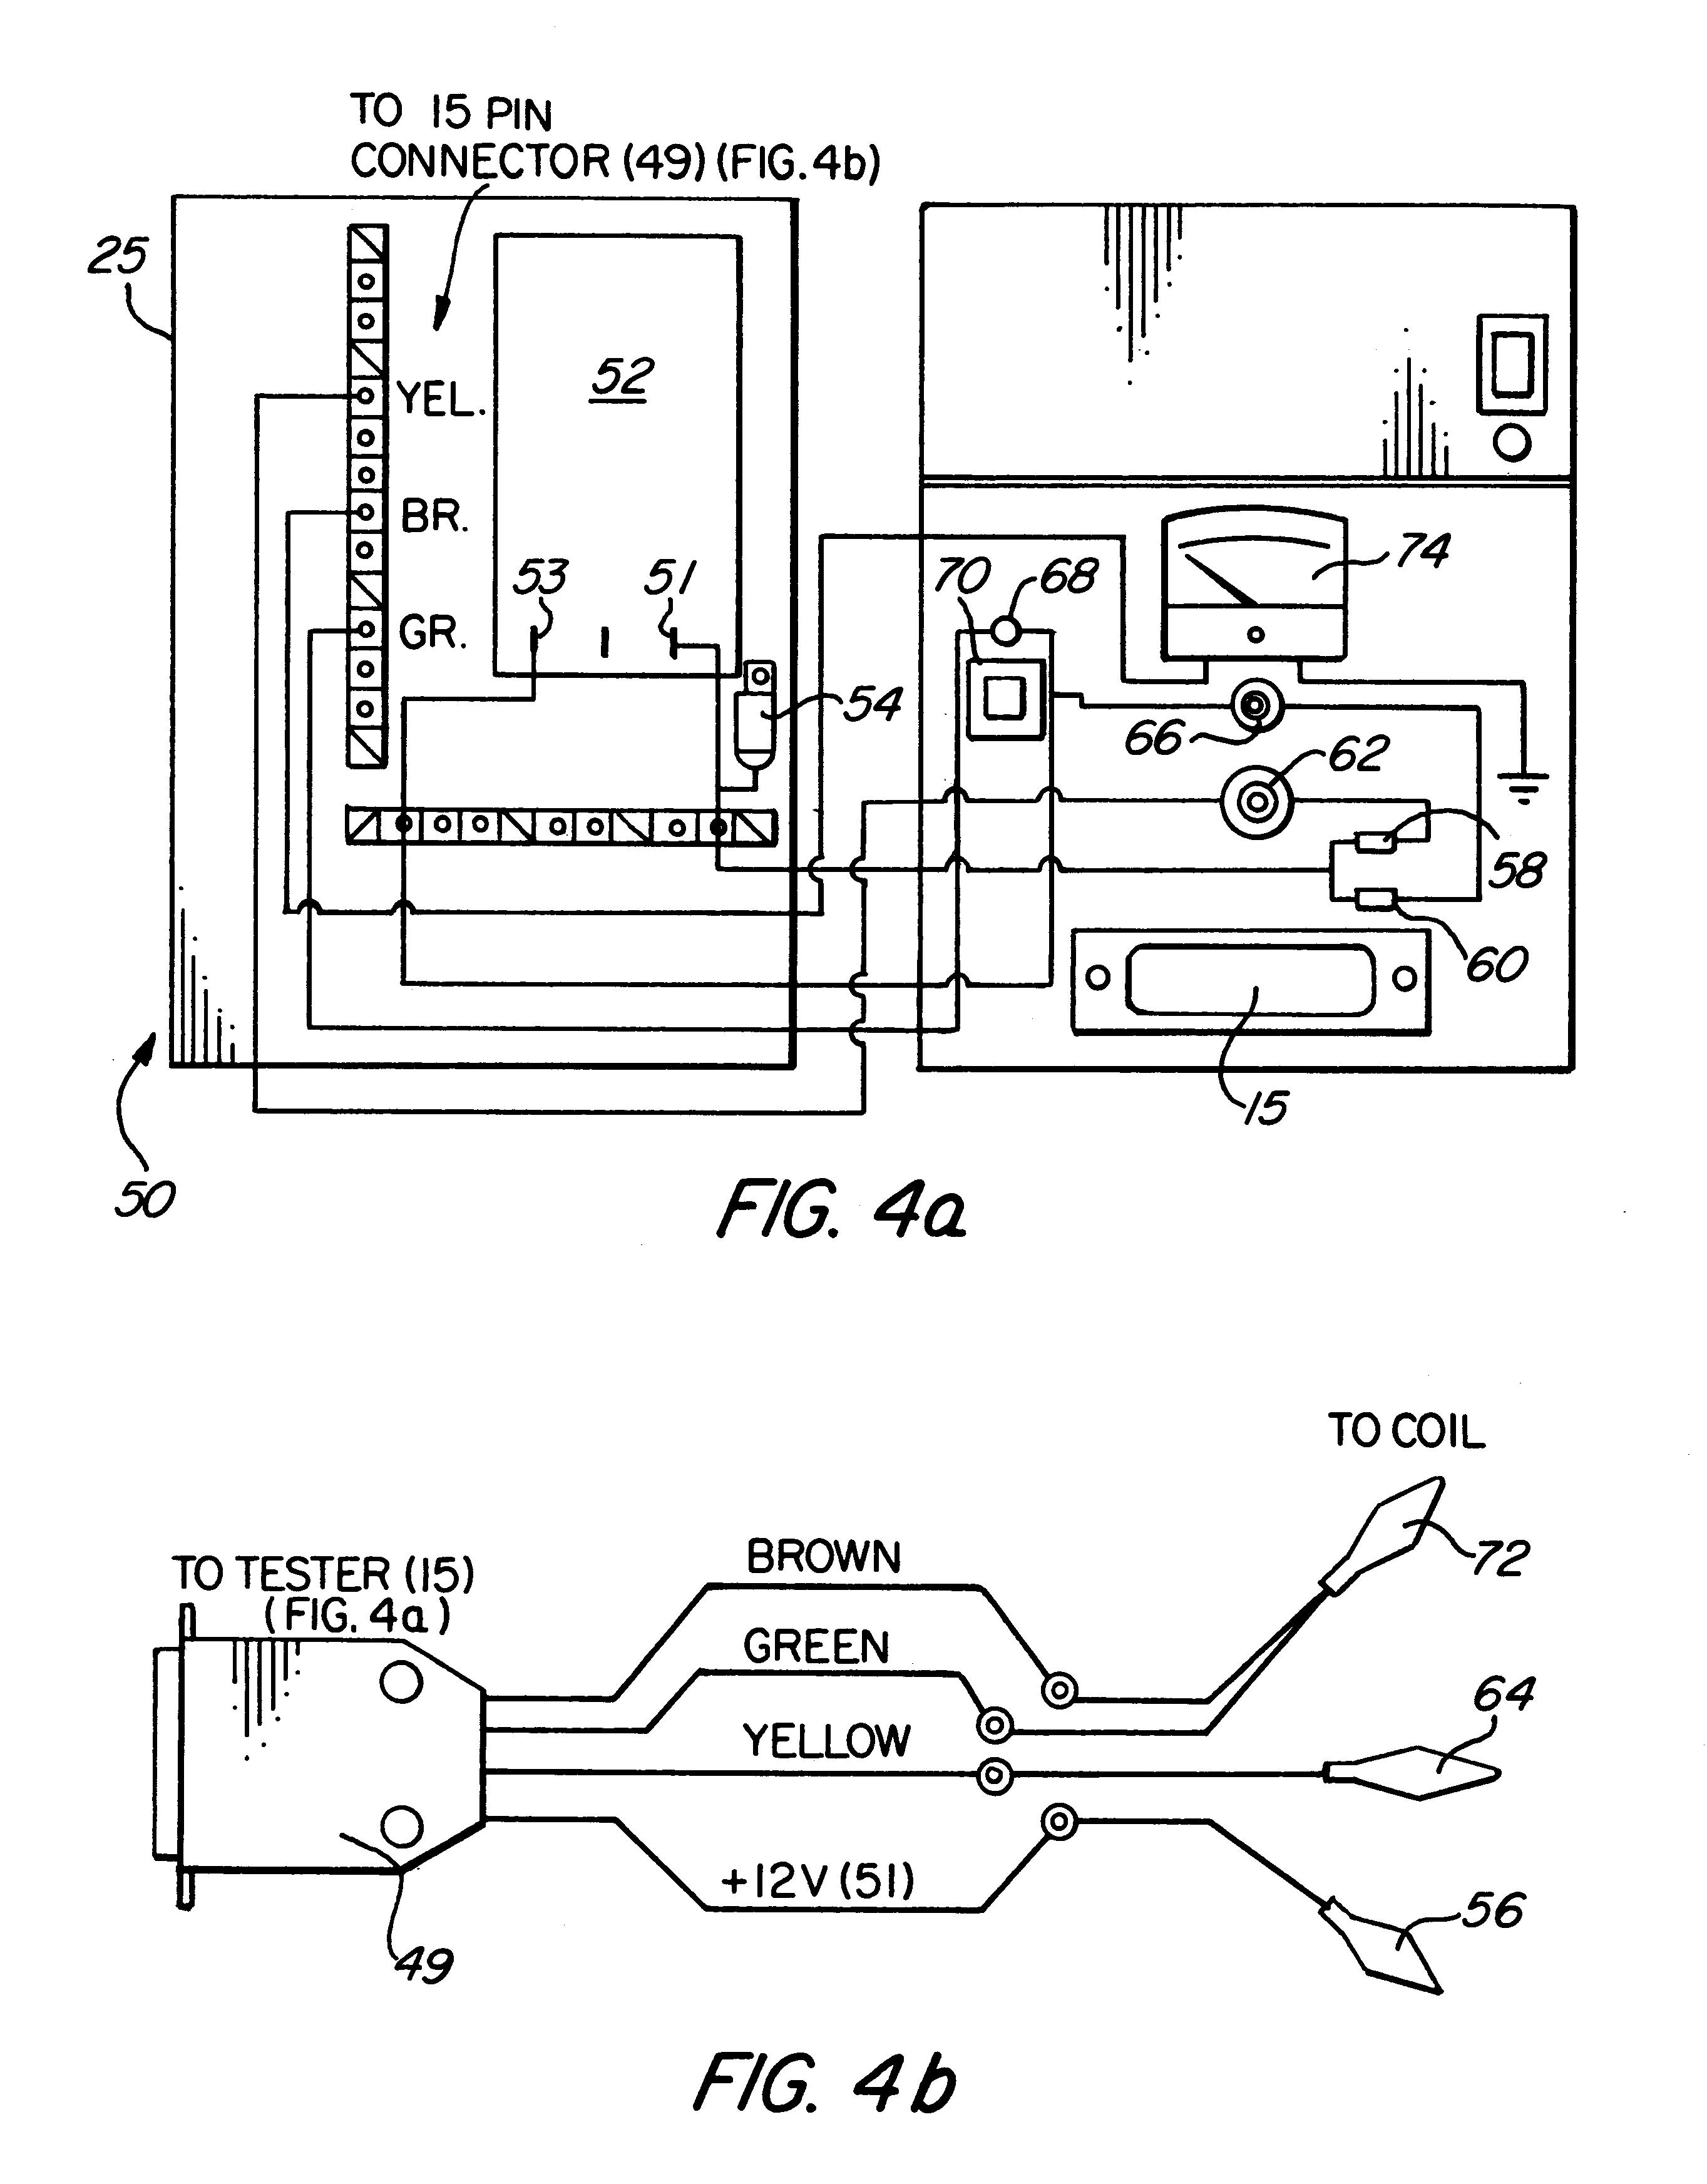 napa-voltage-regulator-1701-wiring-diagram-5  Wire Voltage Regulator Wiring Diagram on amc alternator, harley sportster, chrysler external, lucas 12 volt, golf cart, three brush generator, what is schematic symbol for, gm external,